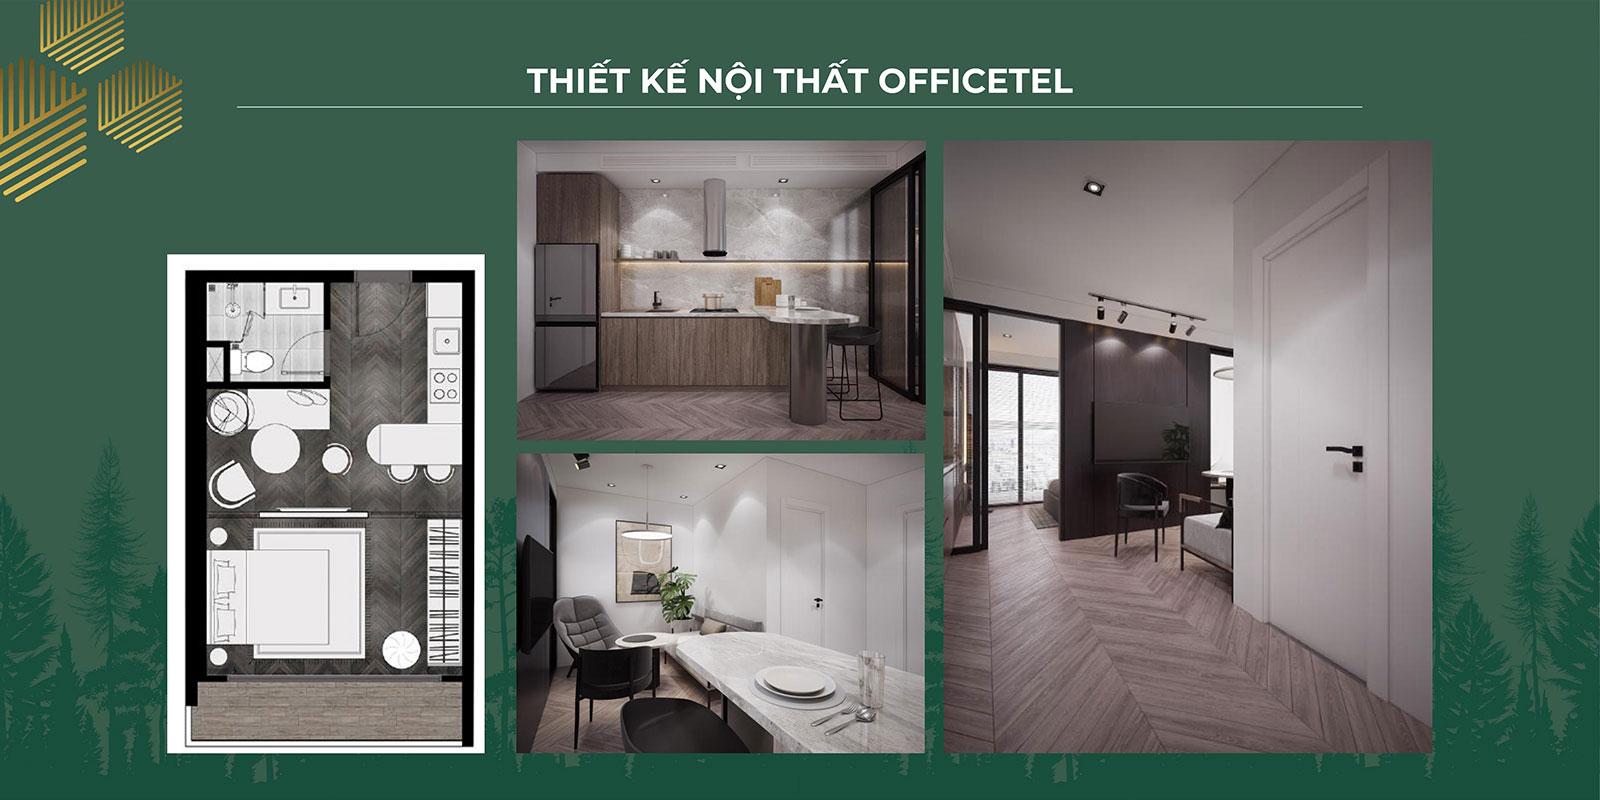 Thiết kế nội thất Officetel